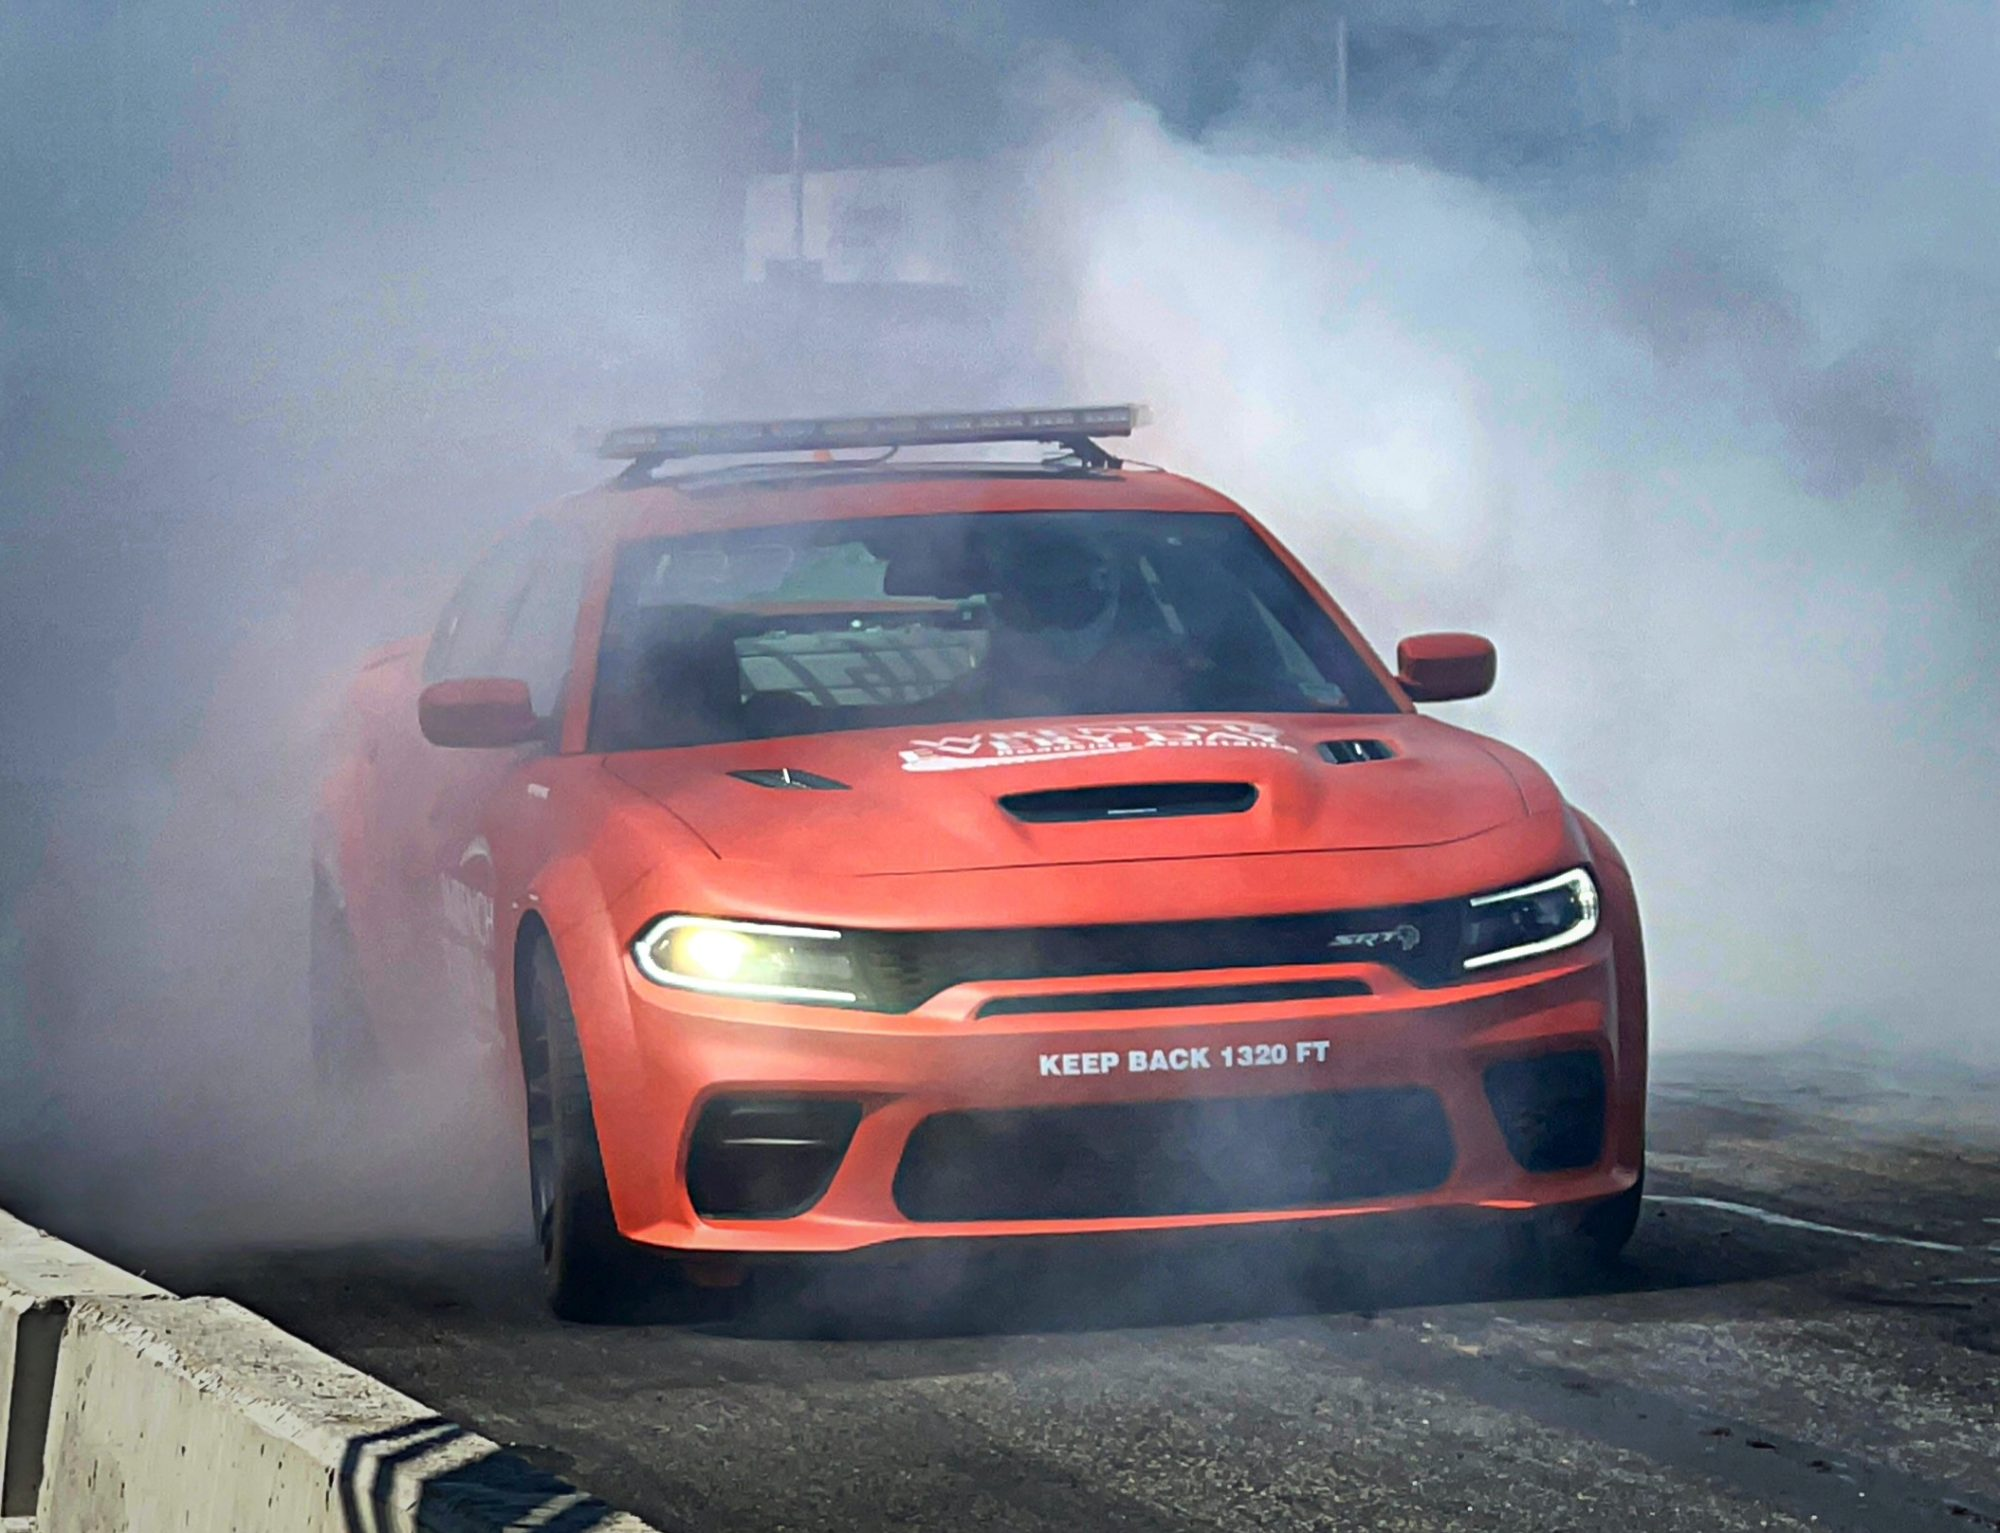 Dodge Charger doing a burnout